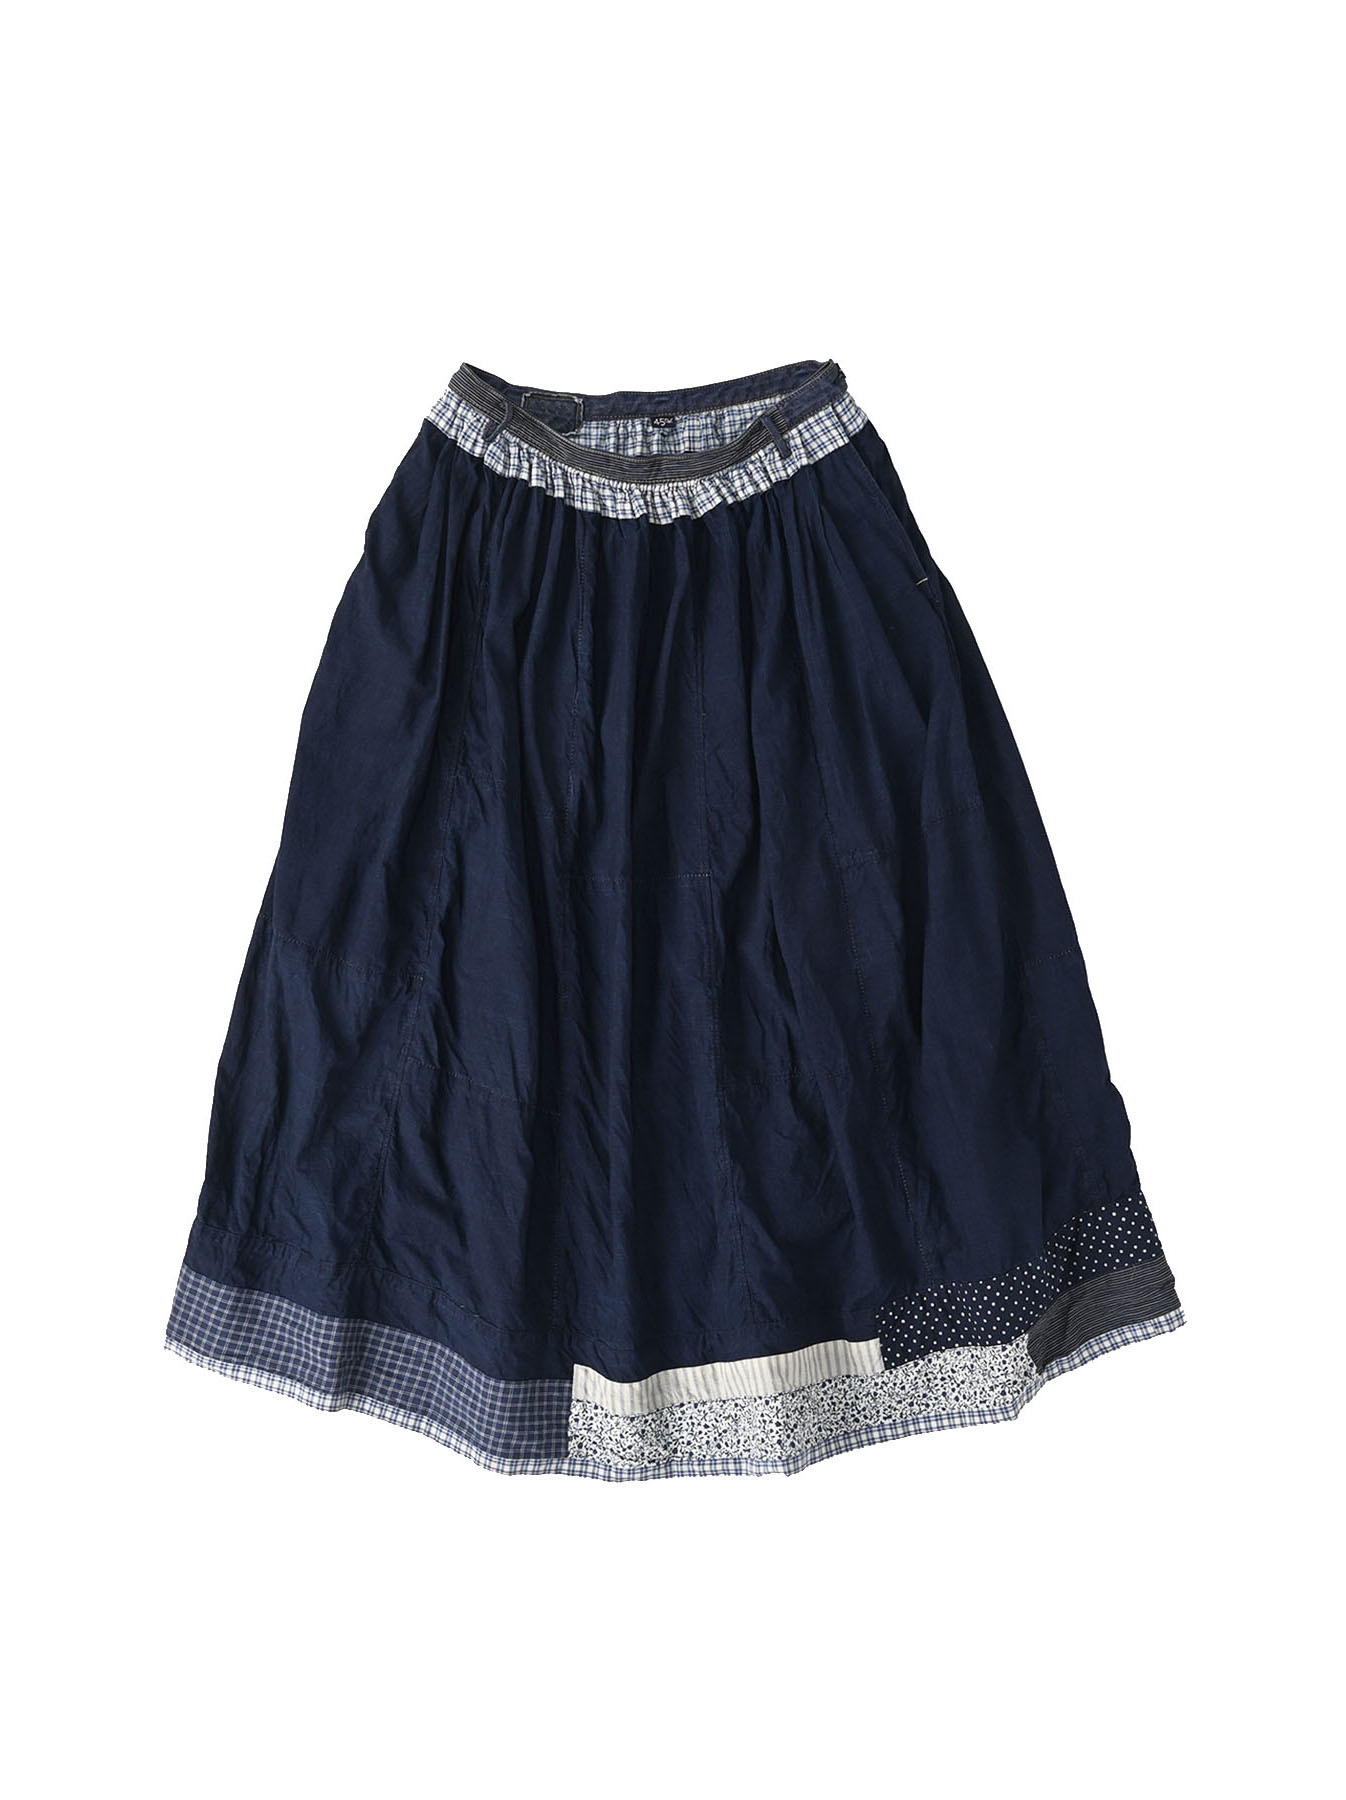 Indigo Tappet Patchwork Skirt-1